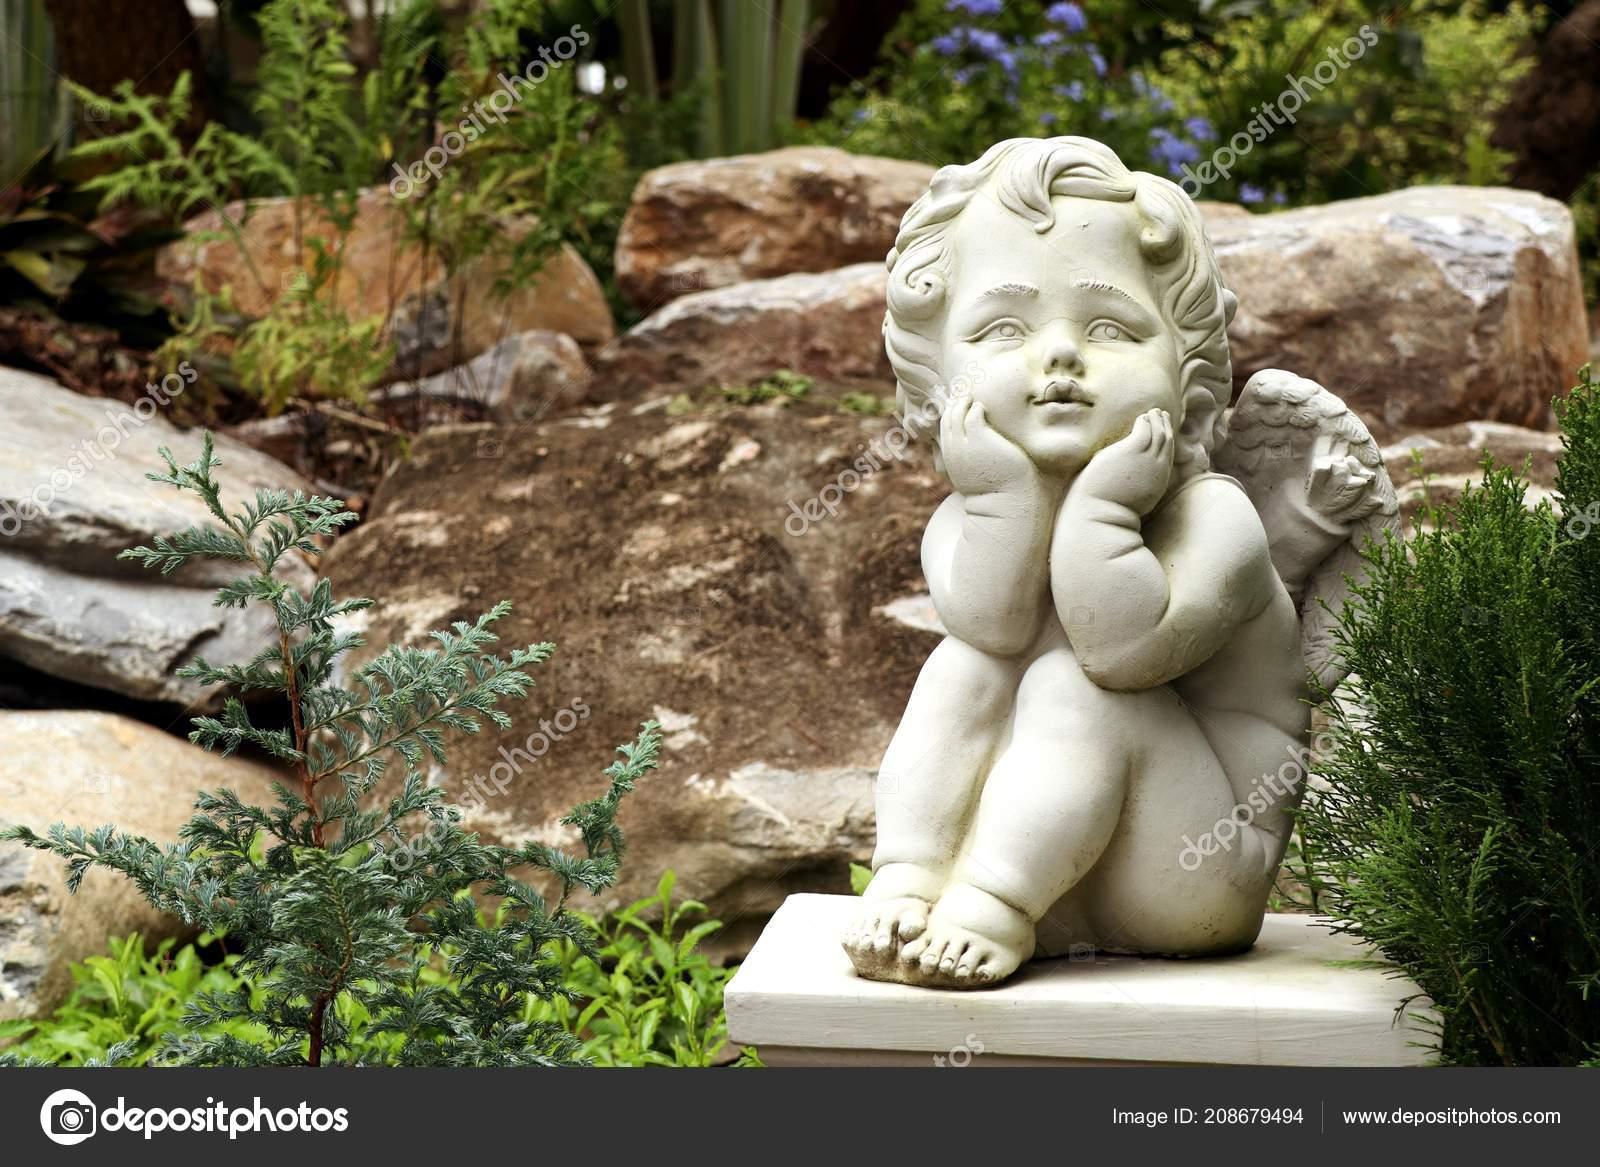 Vintage Sculpture Garden Decoration — Stock Photo © oilslo #208679494